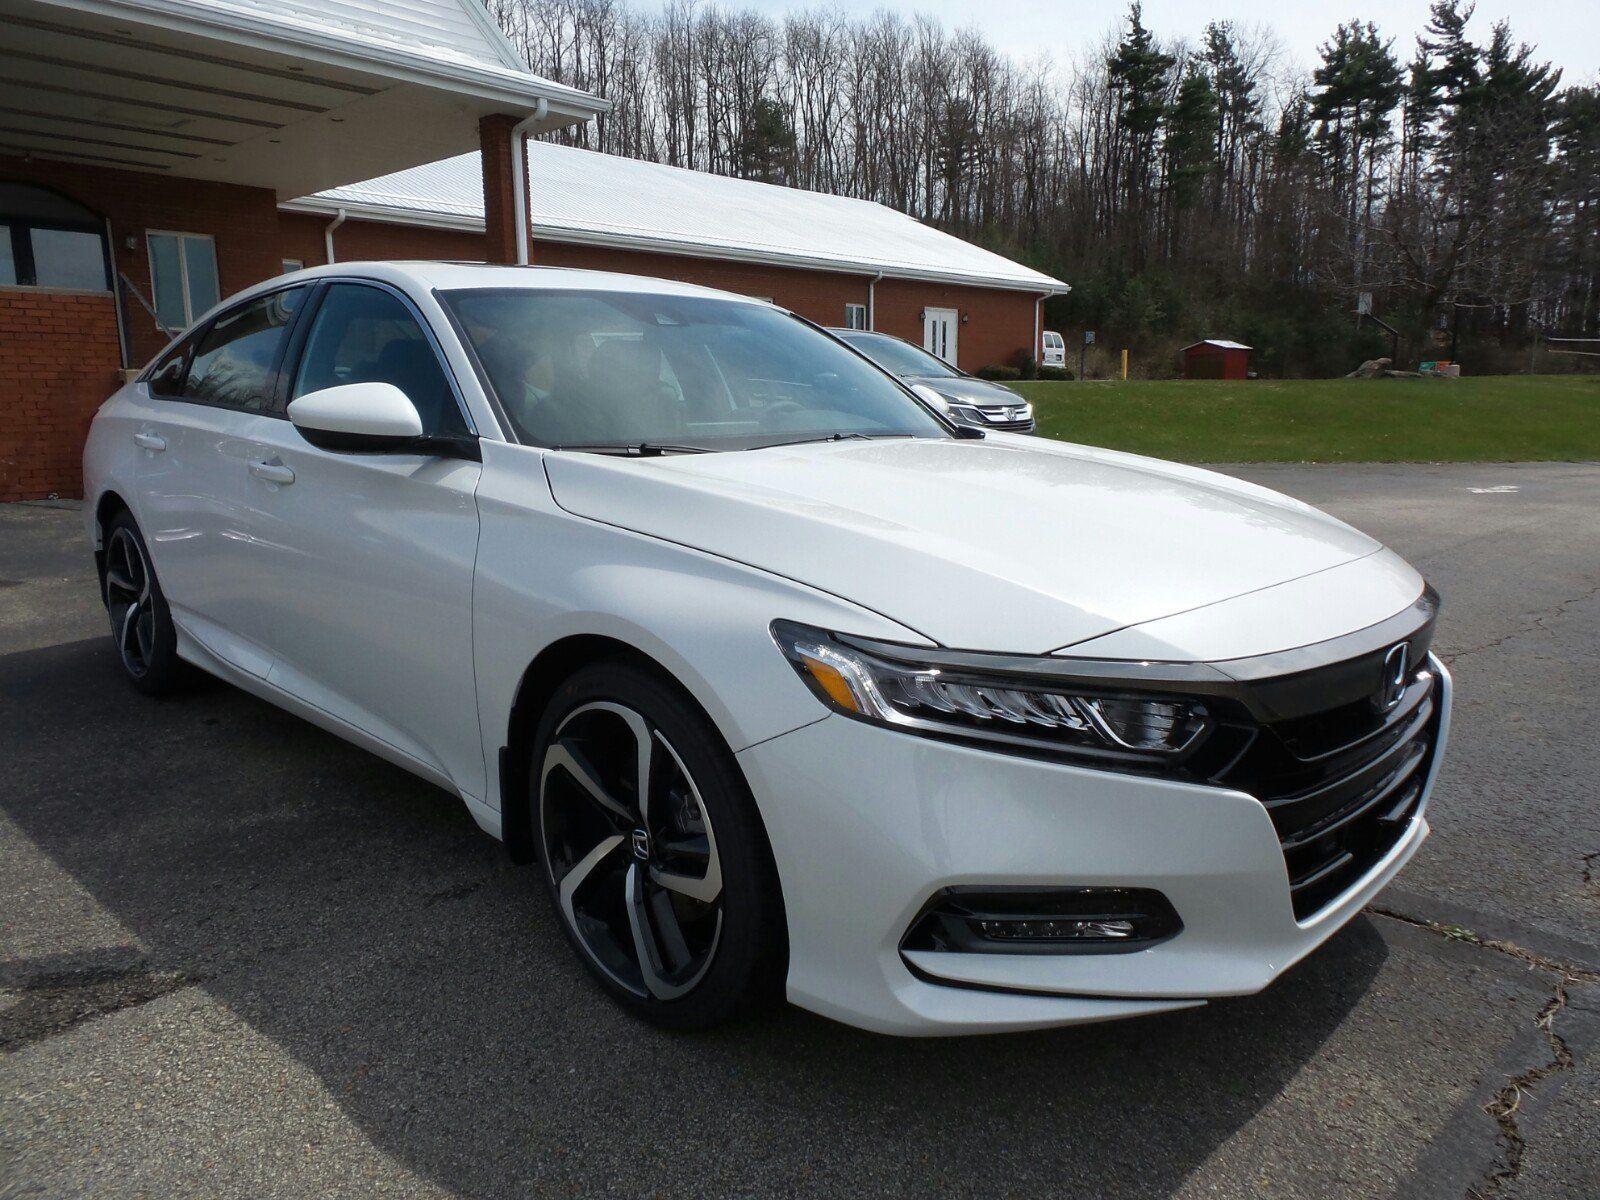 New 2018 Honda Accord Sedan Sport 2.0T 4Dr Car In Indiana